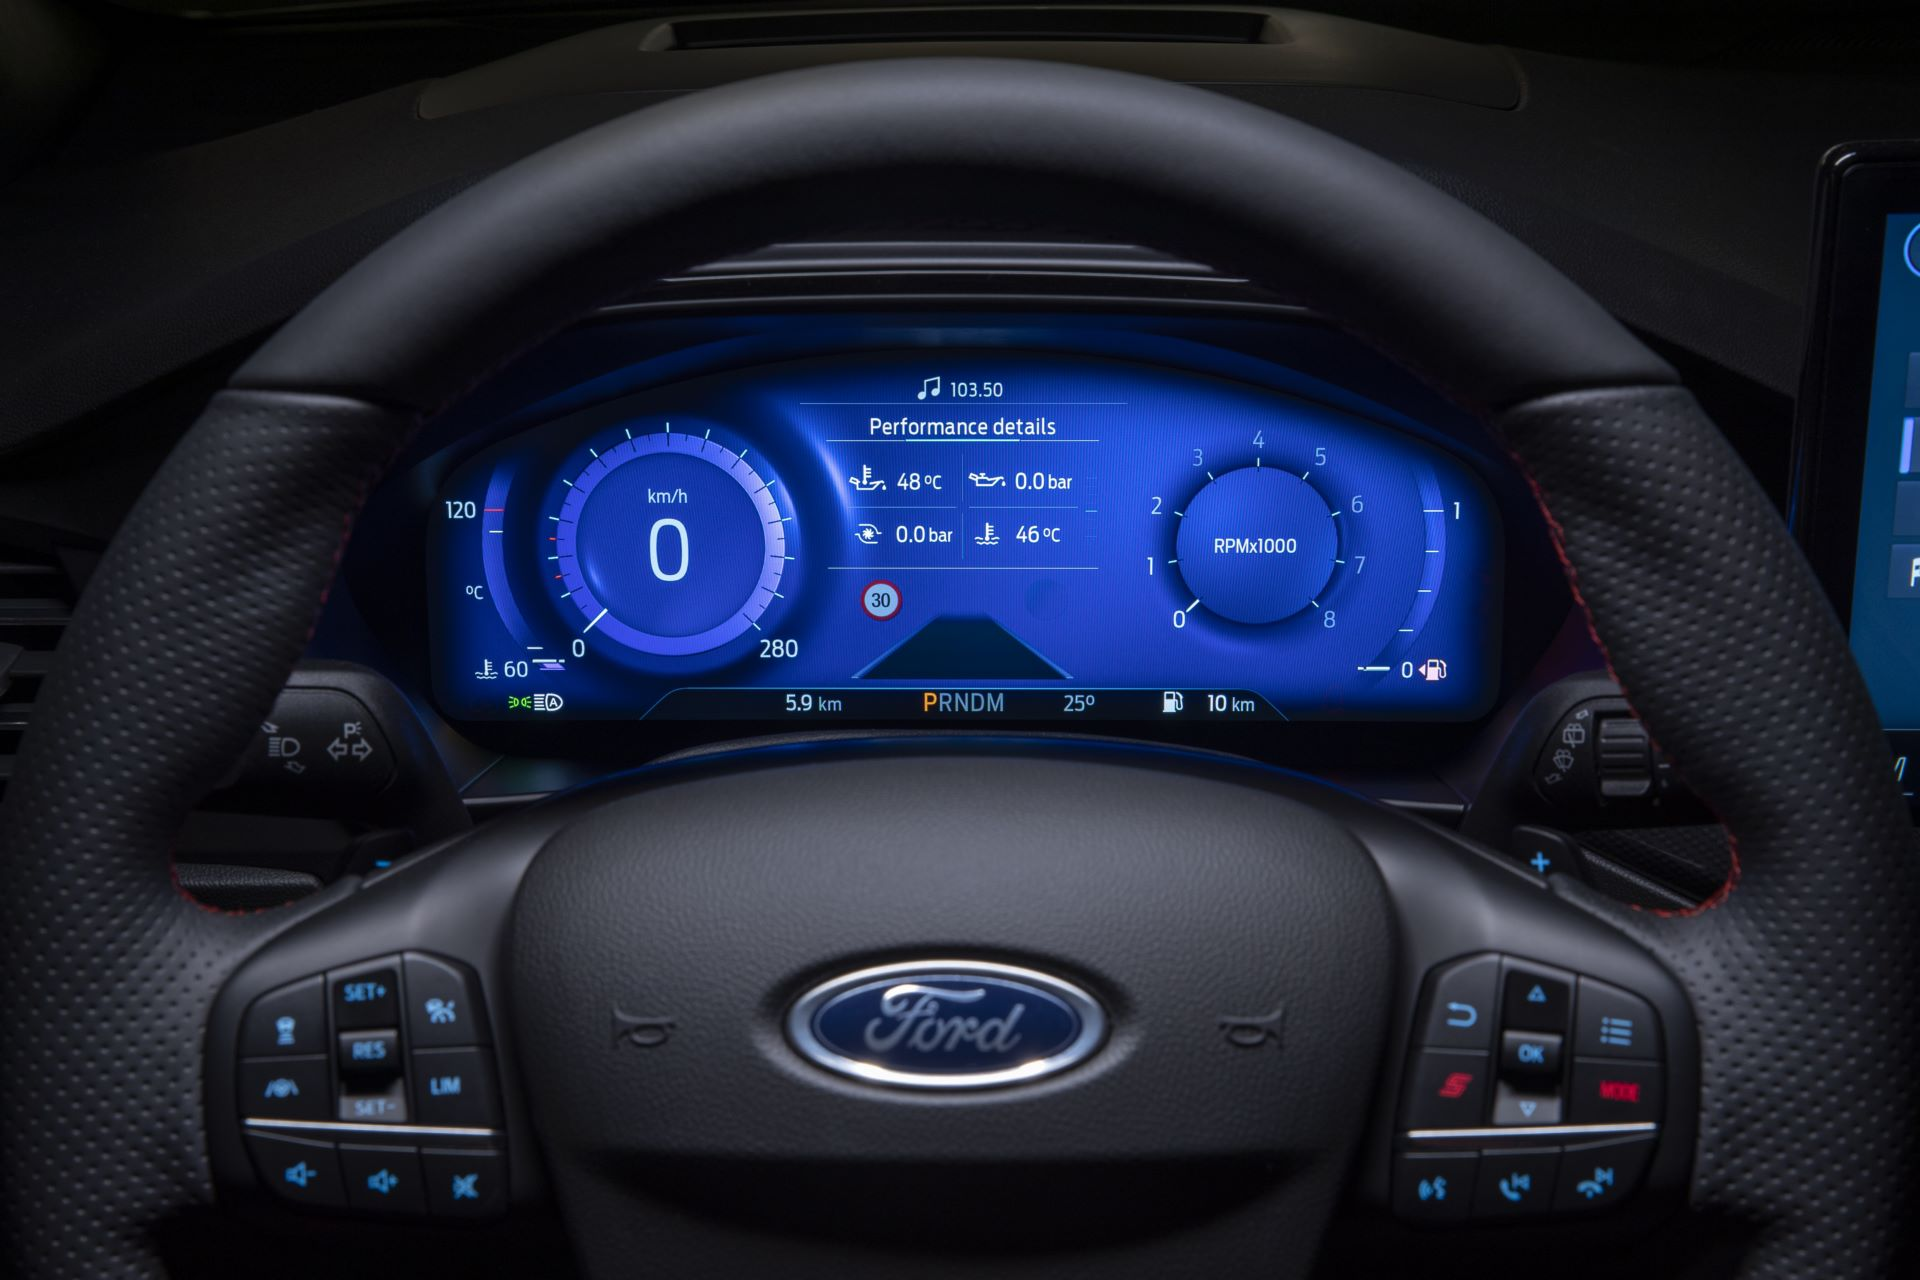 Ford-Focus-ST-facelift-2021-8